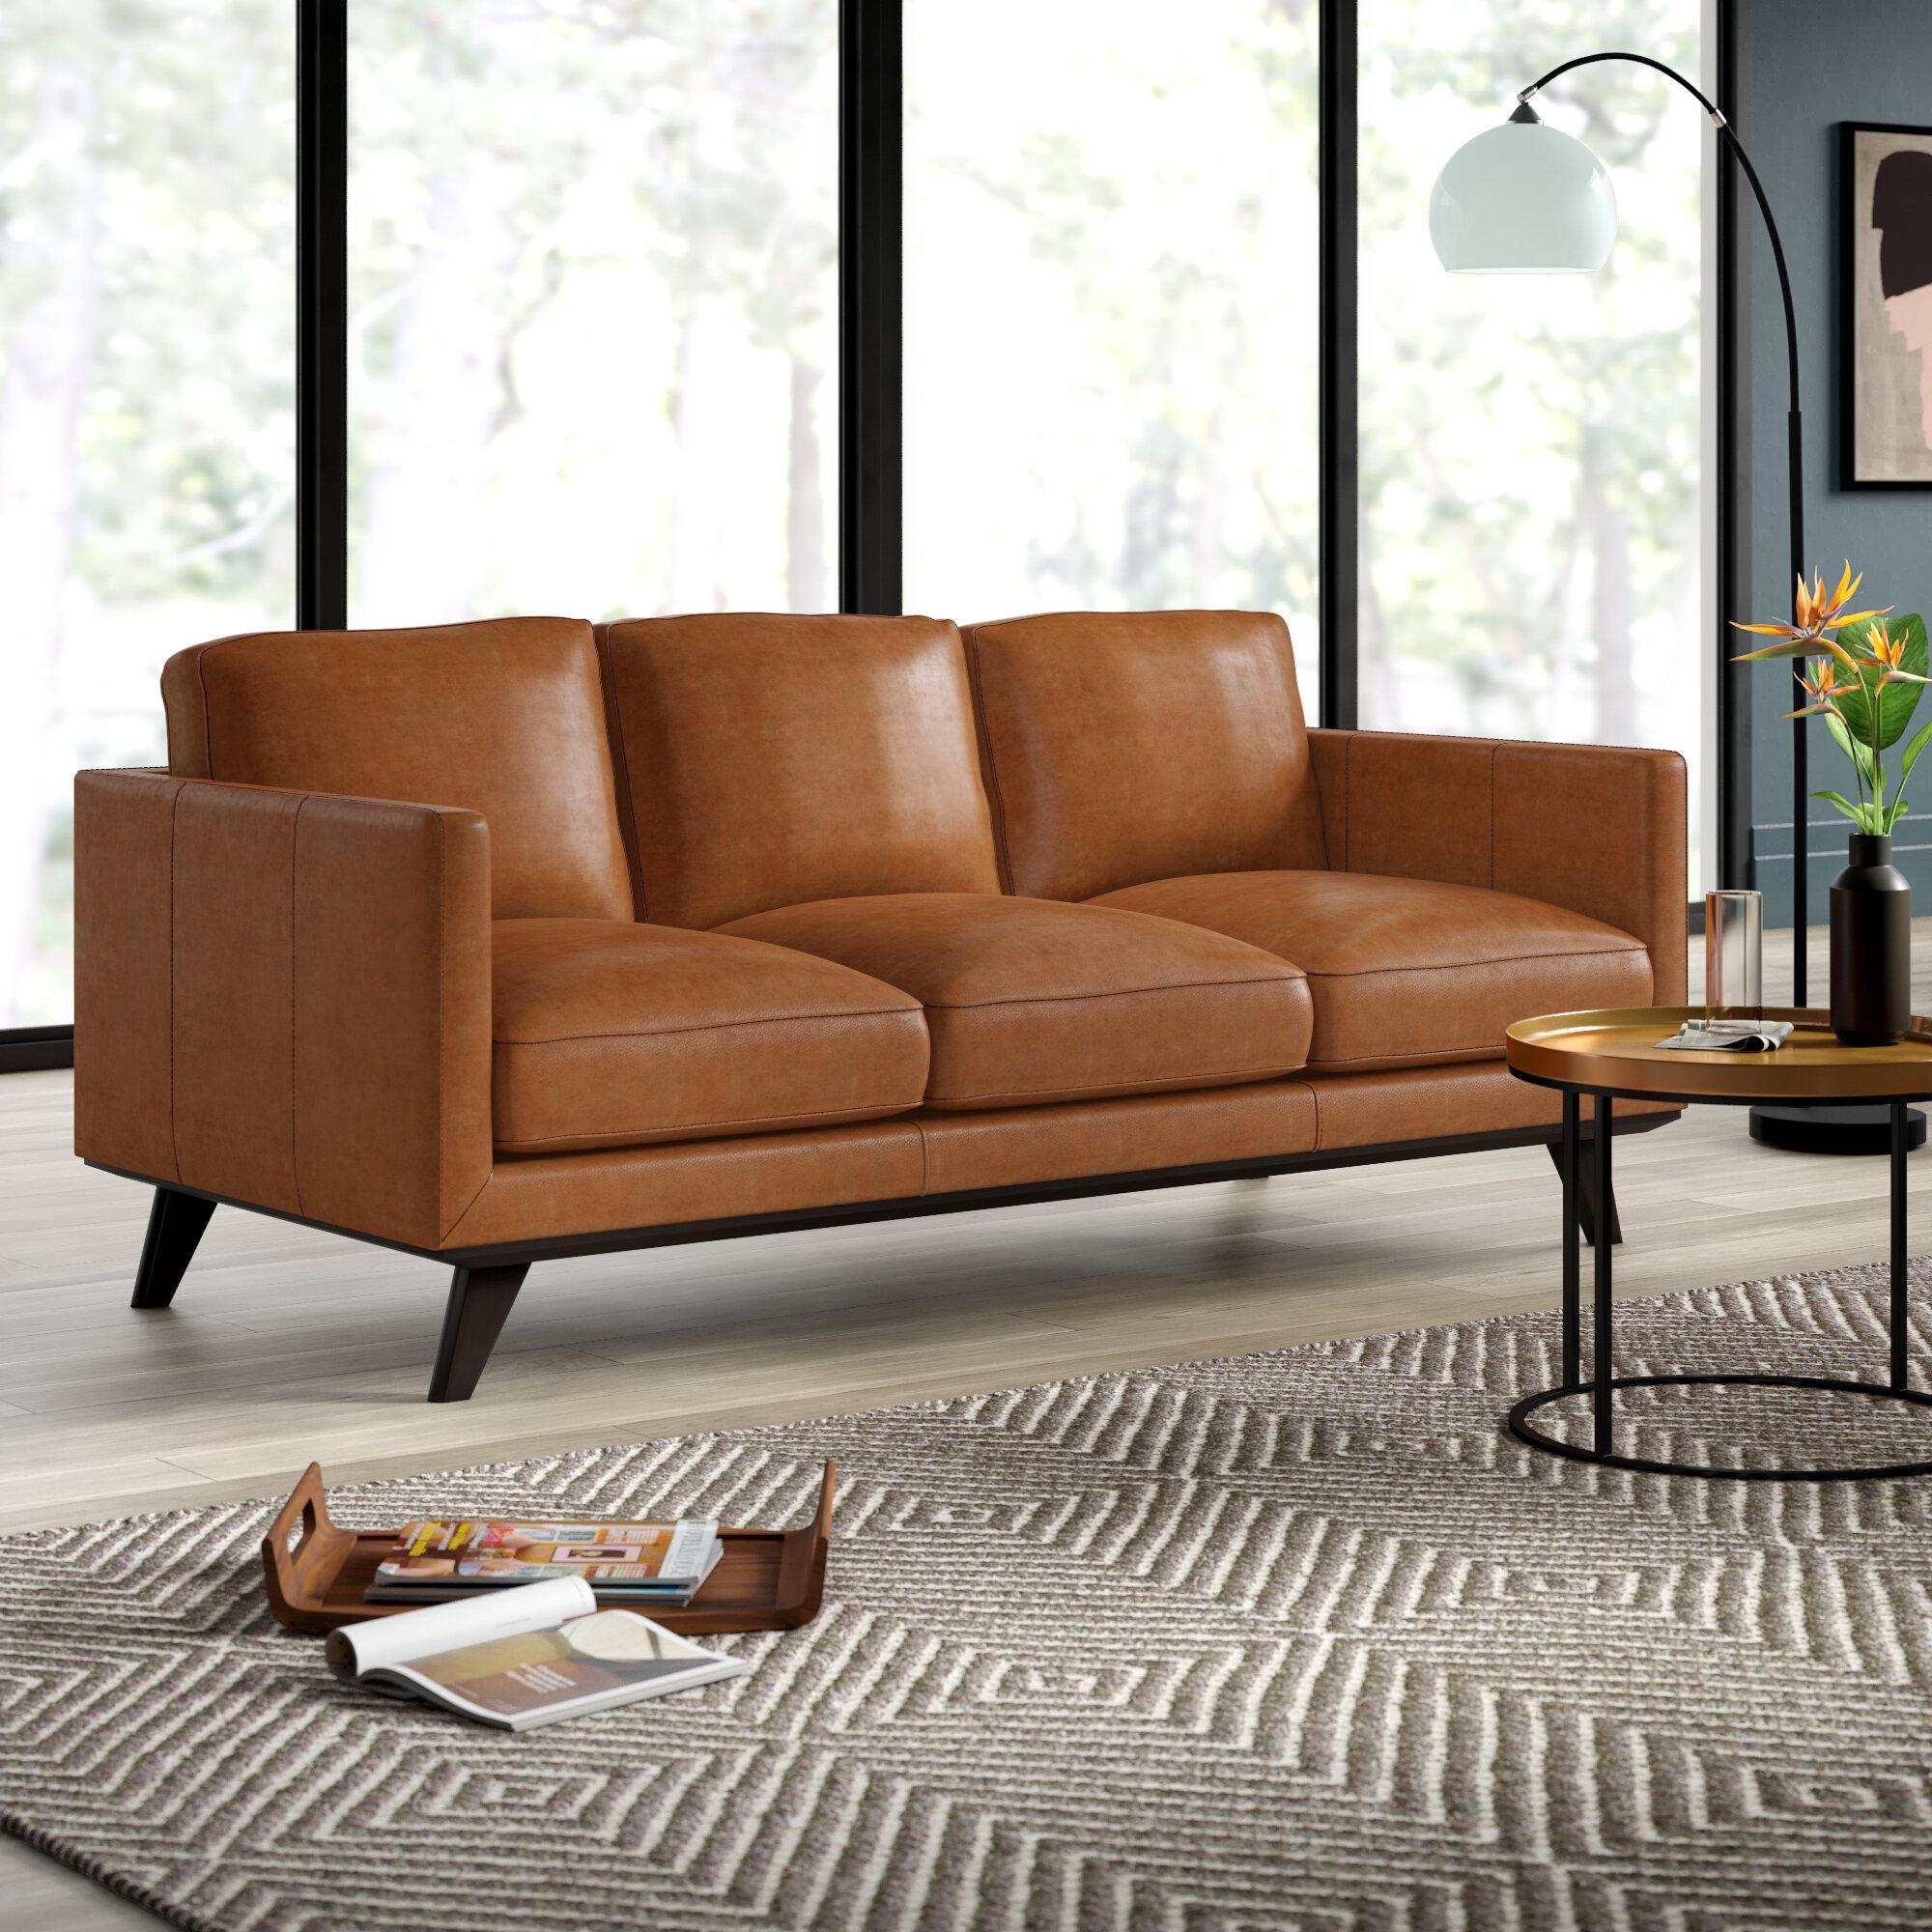 Brilliant Mercury Row Northwick Leather Sofa Reviews Wayfair Beatyapartments Chair Design Images Beatyapartmentscom